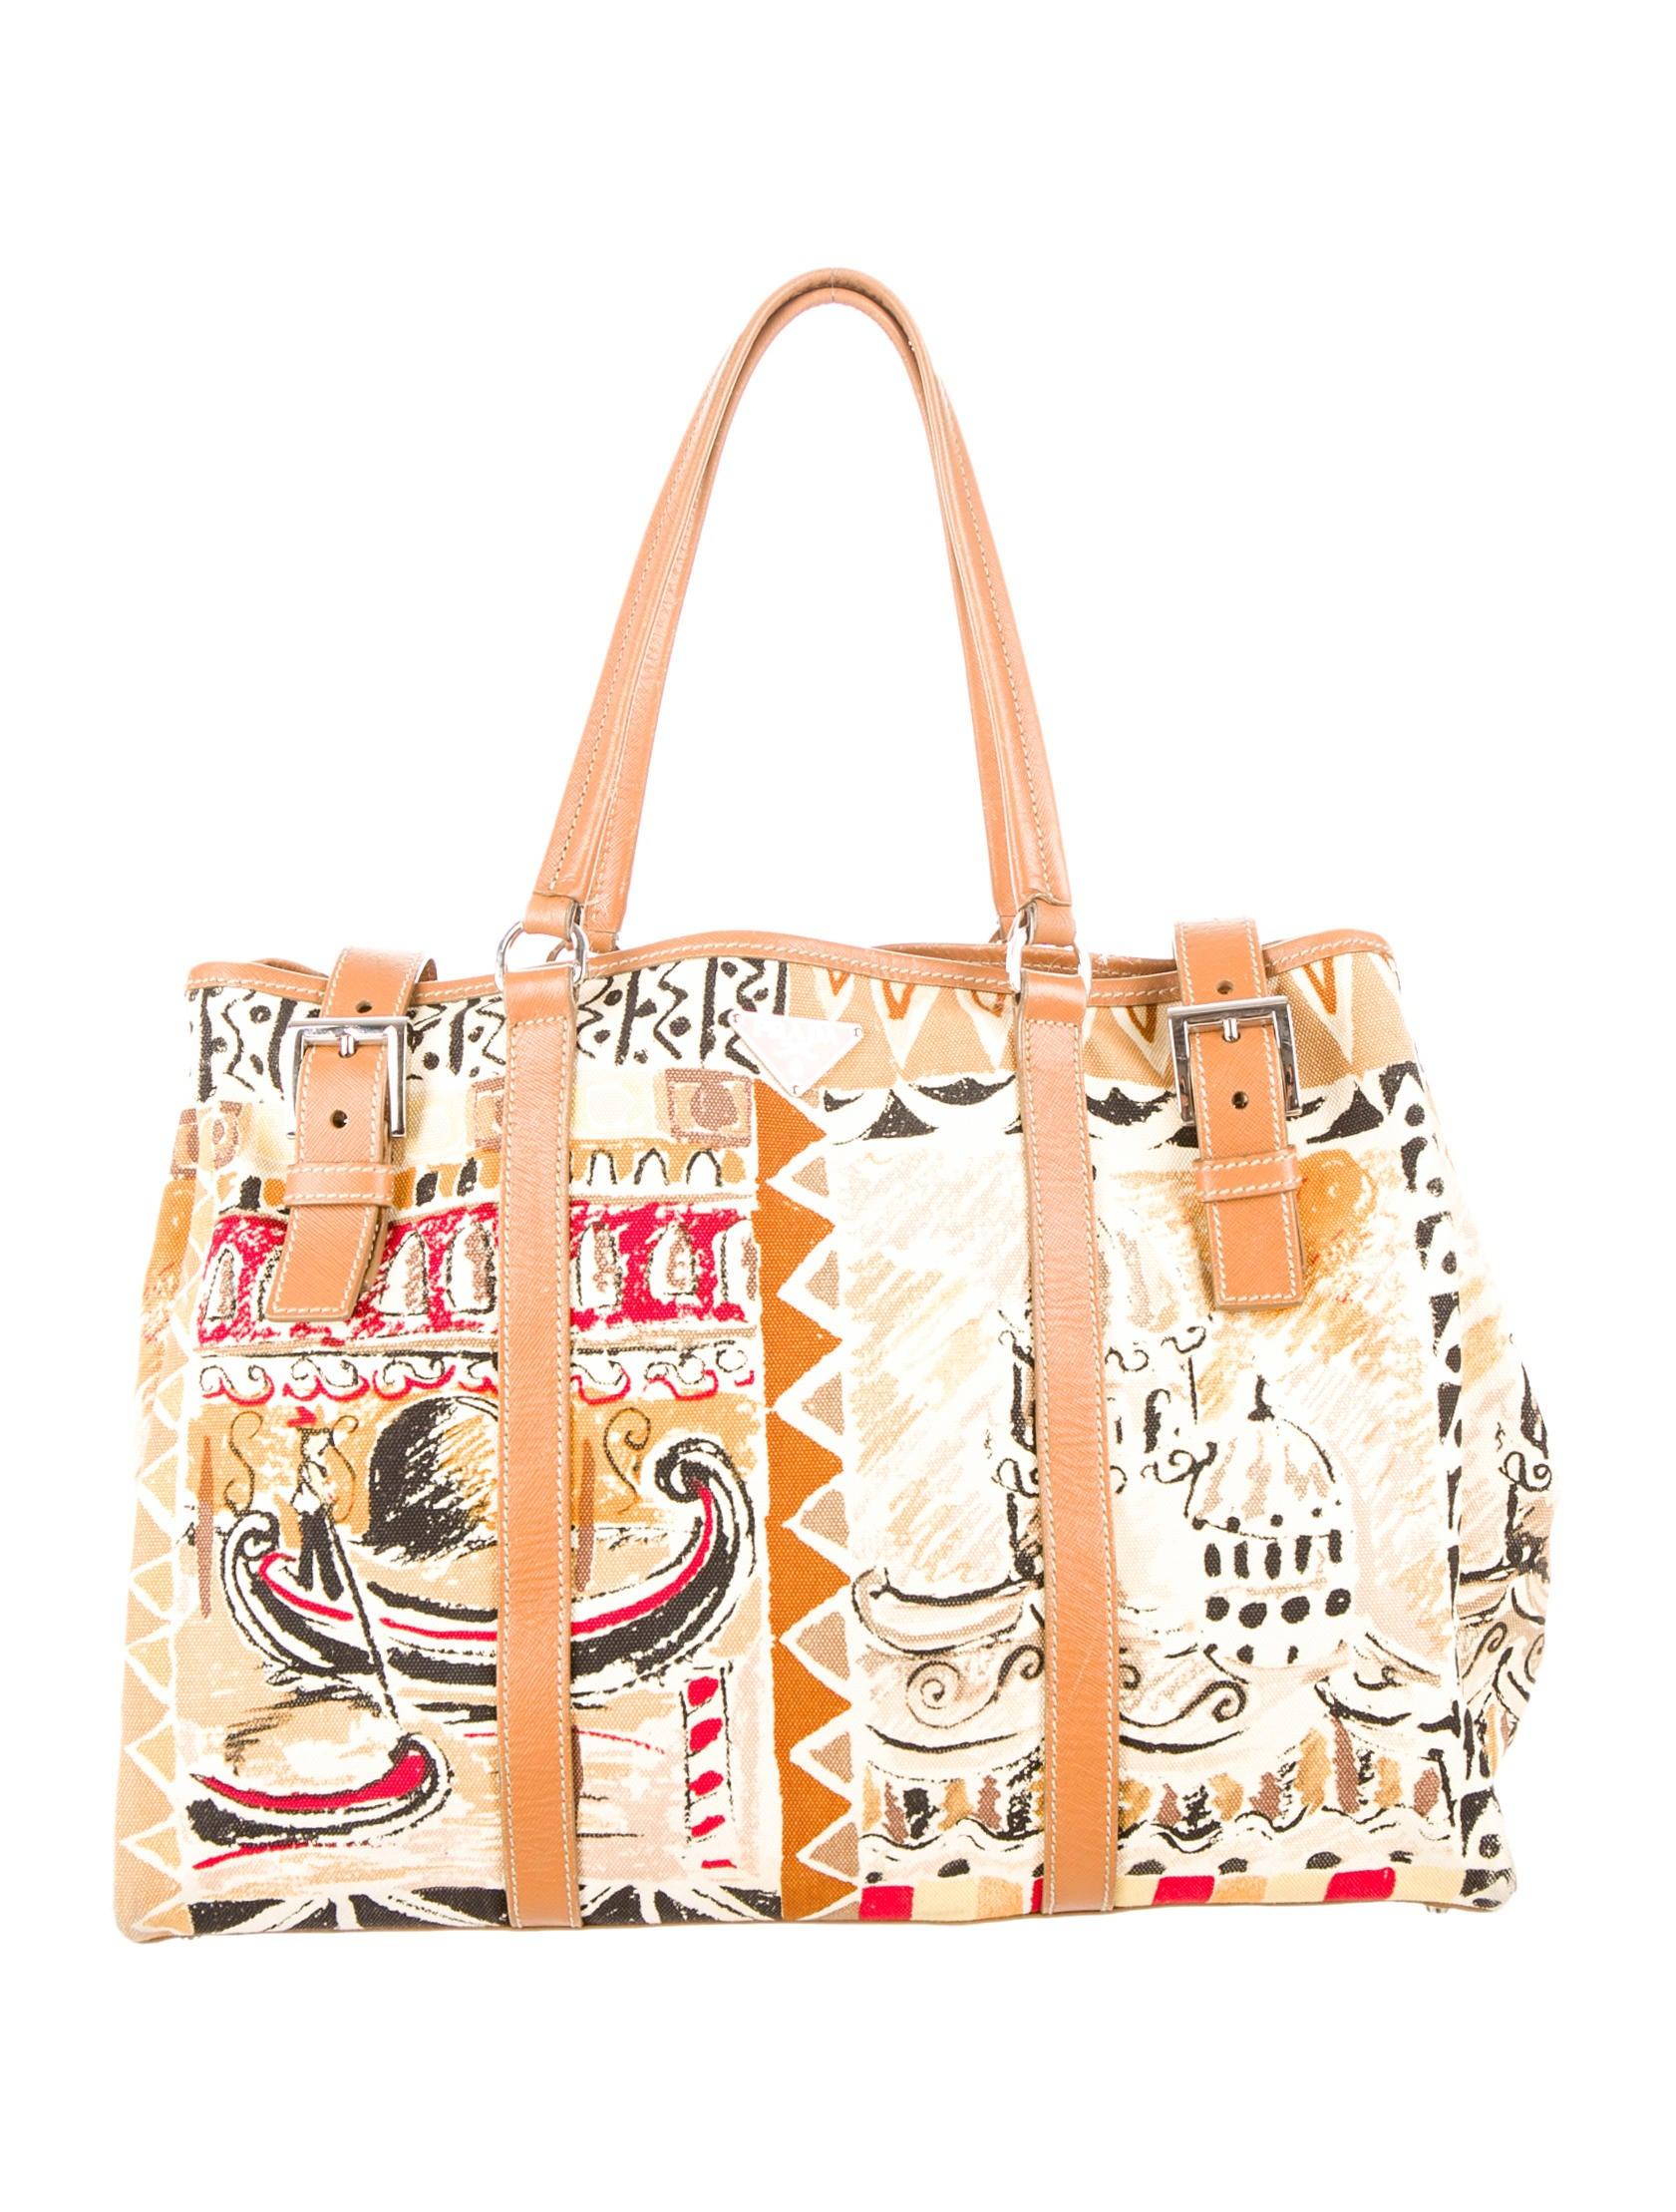 Prada Venice Canvas Tote - Handbags - PRA51624  ca408b7d76560